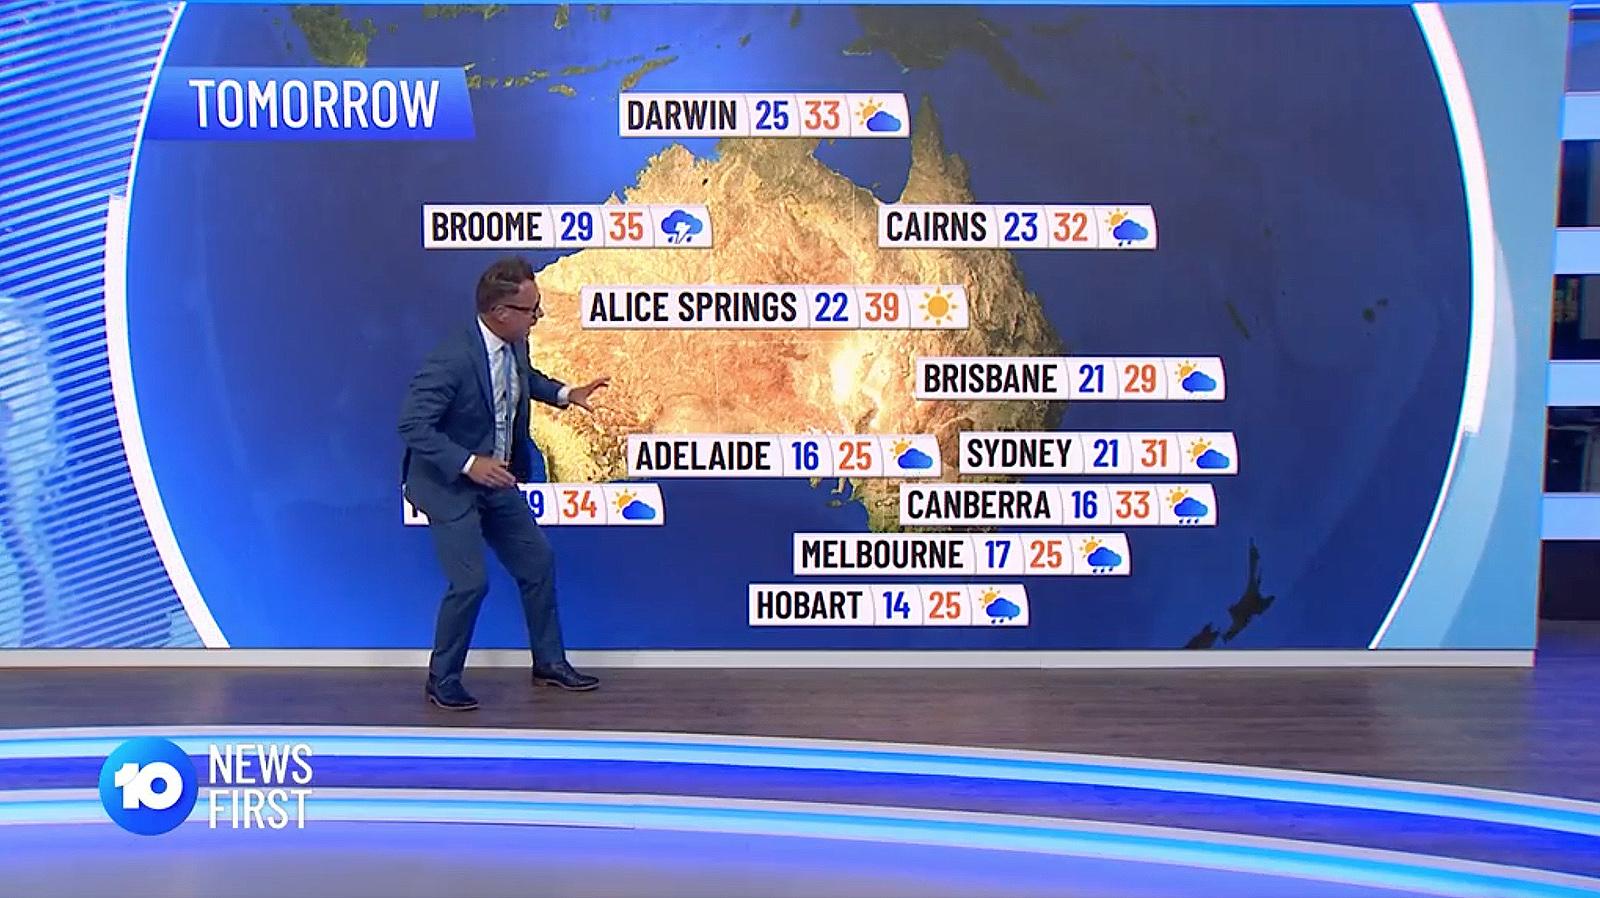 NCS_Network-10-Sydney-10-News-First-studio_031